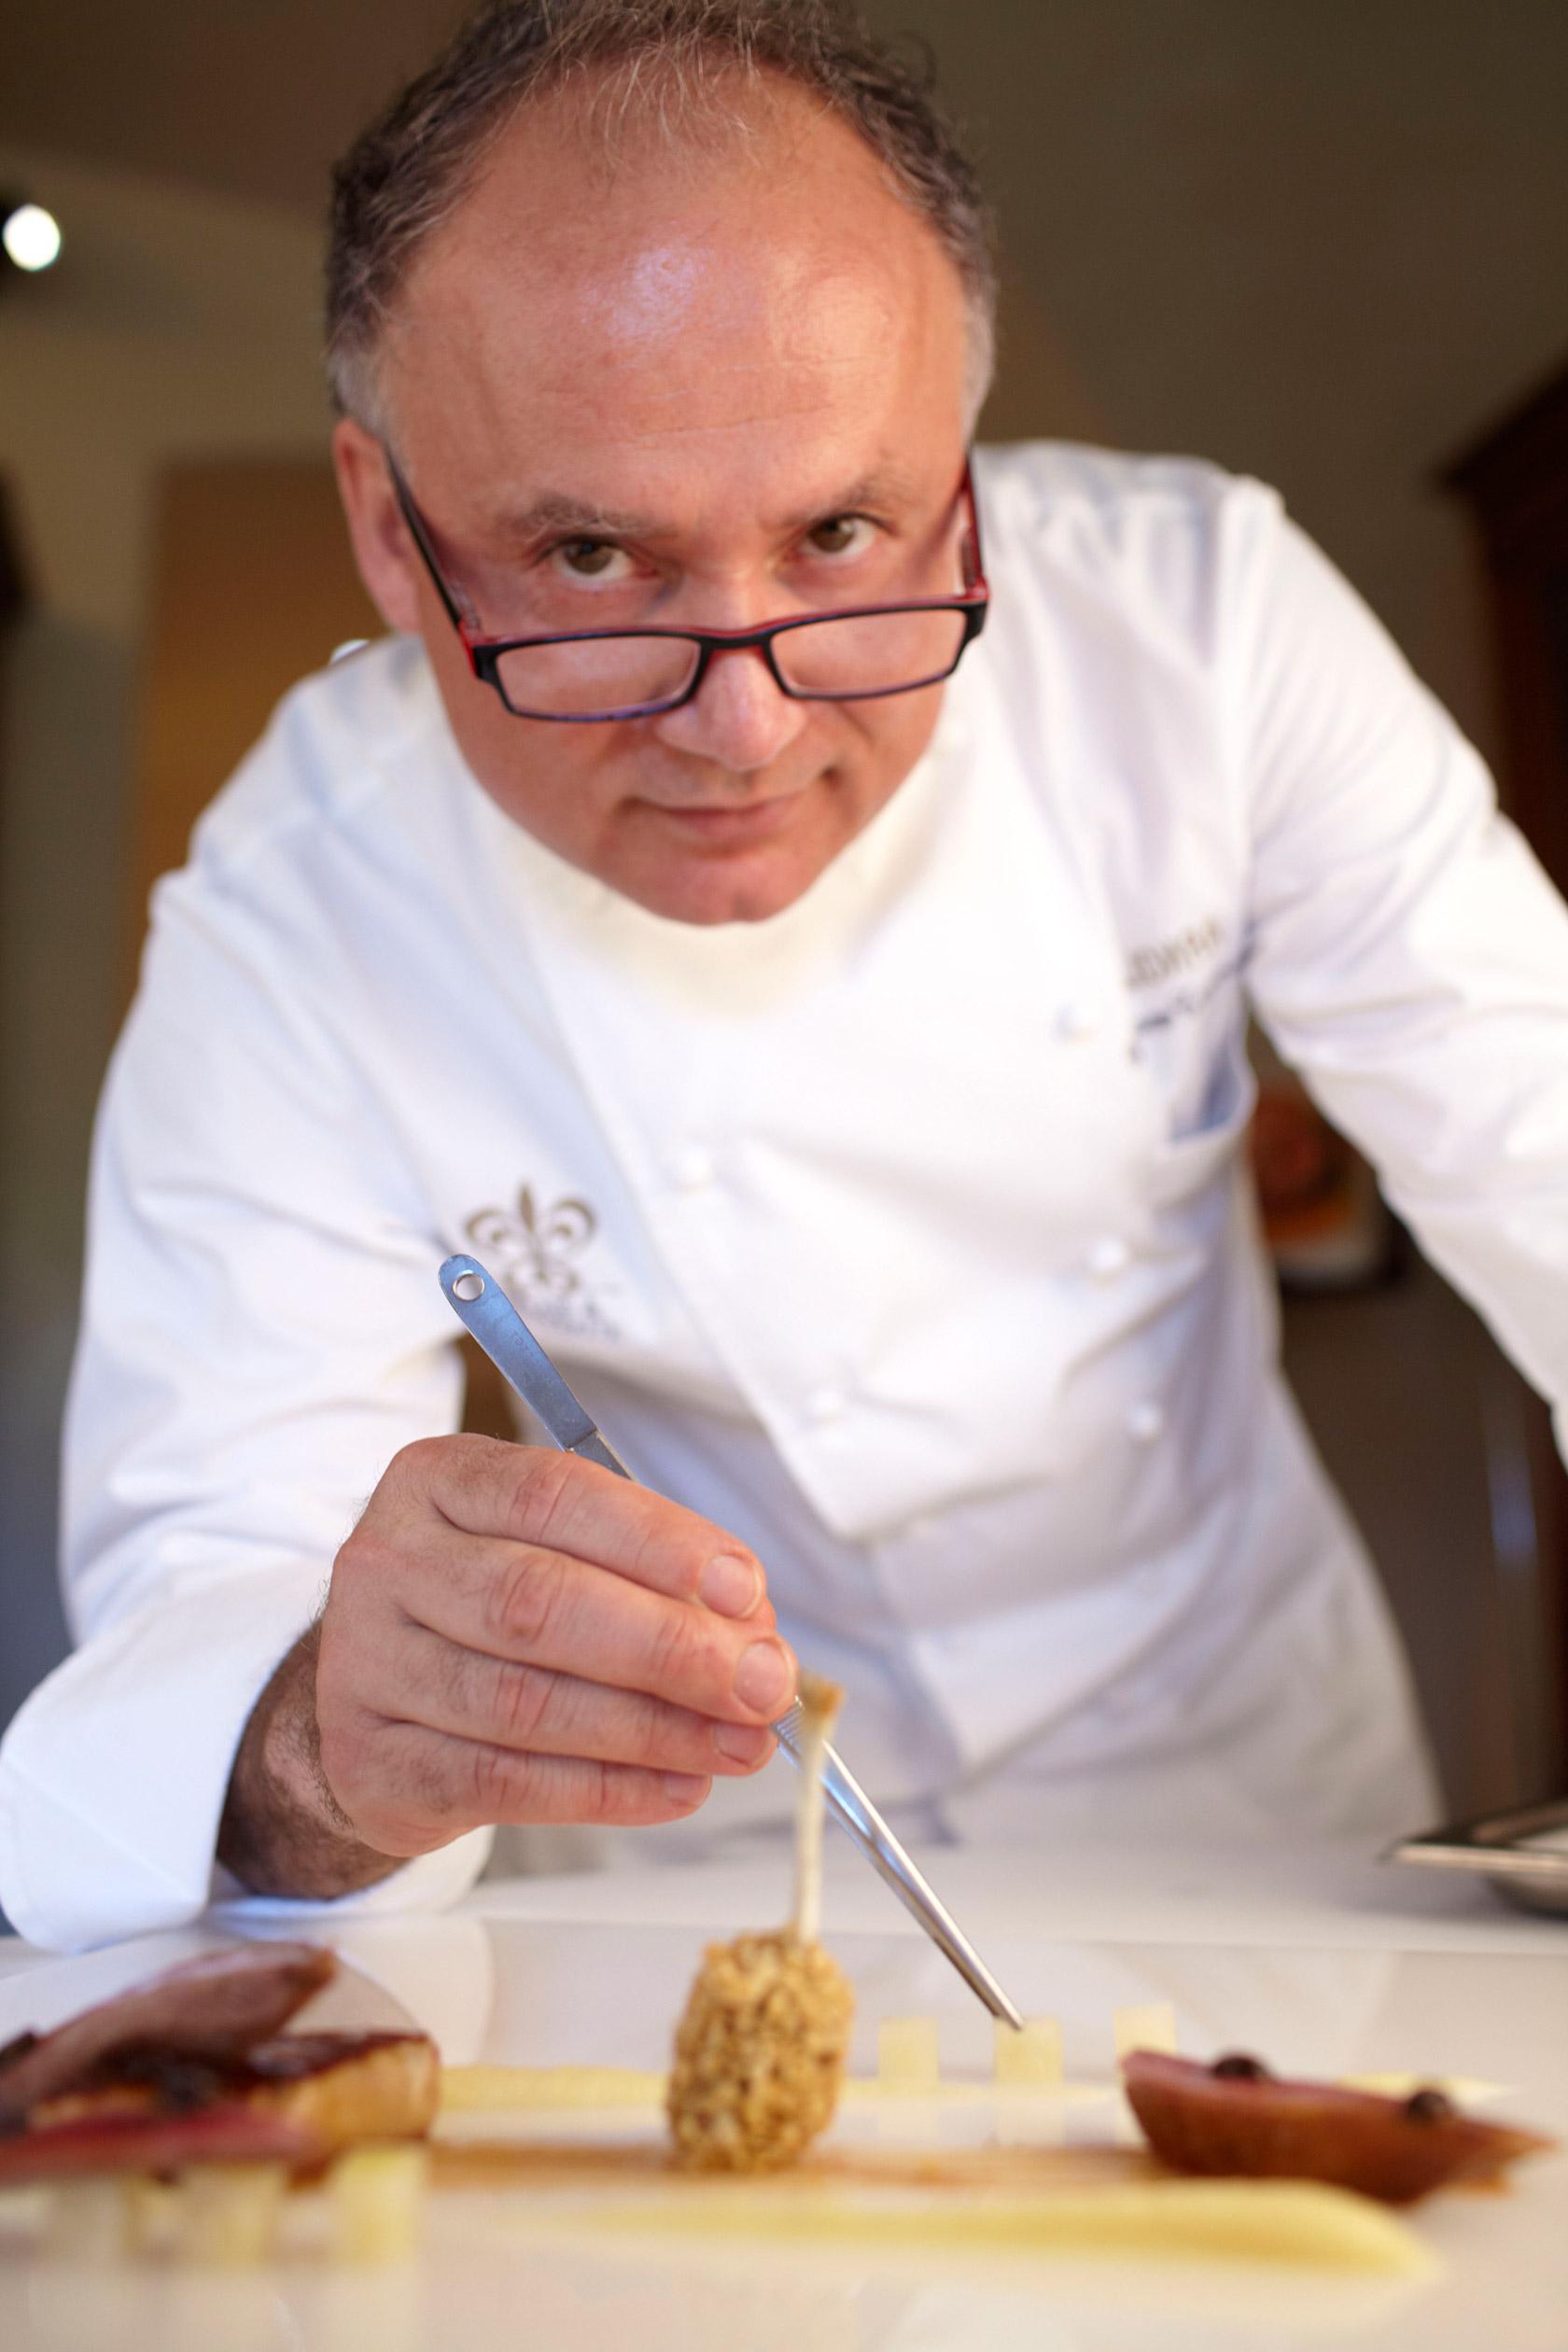 relais-chateau-chef-gaetano-trovato